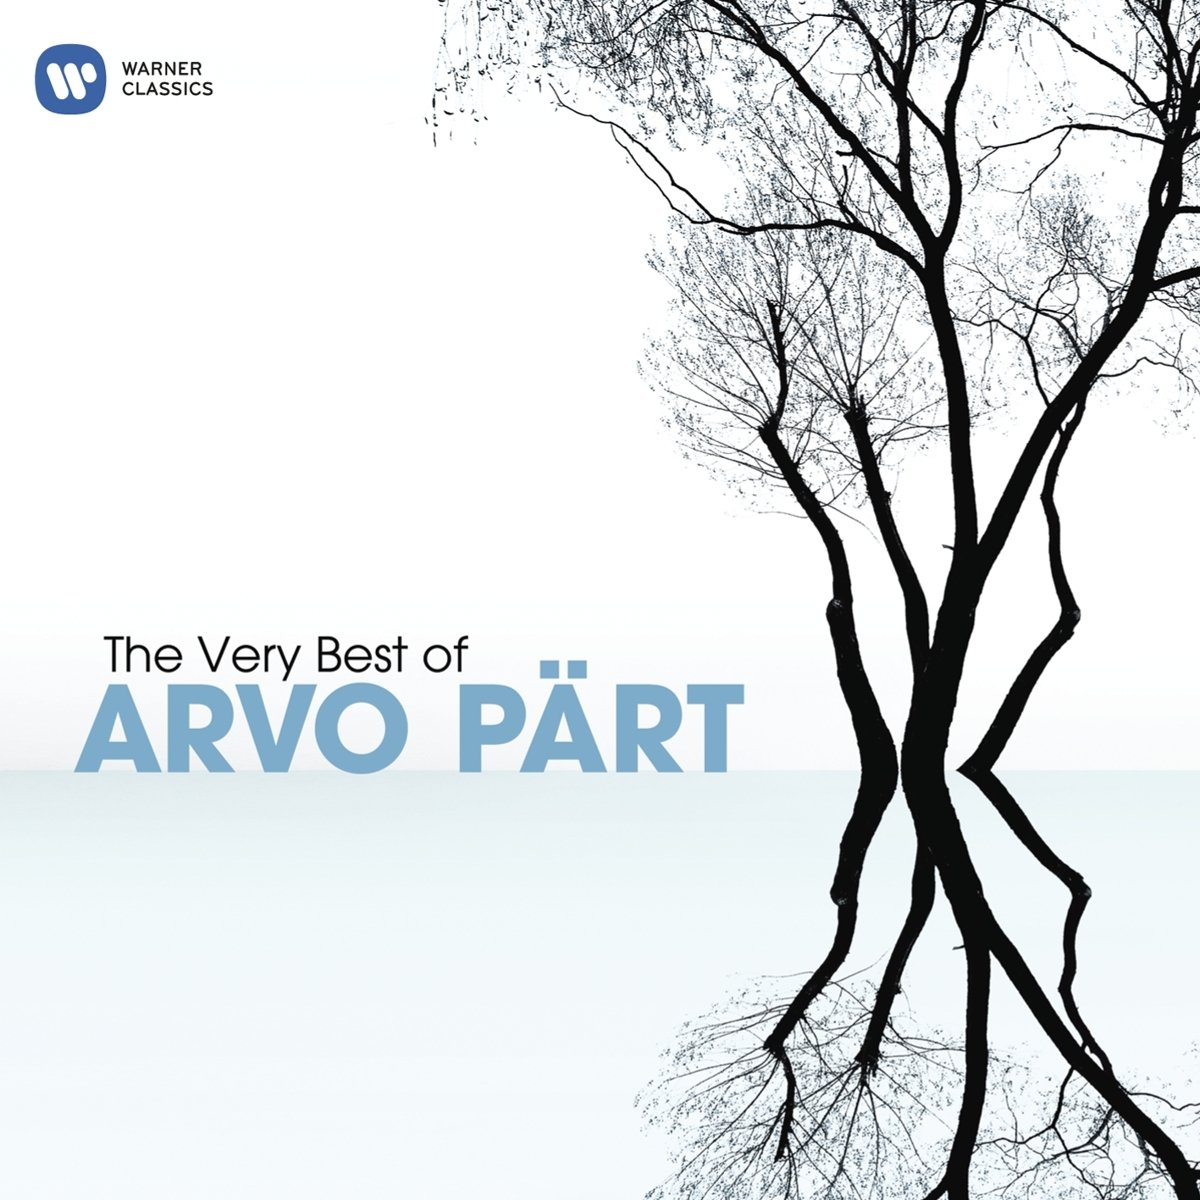 The Very Best Of Arvo Part: Various Artists: Amazon.es: Música